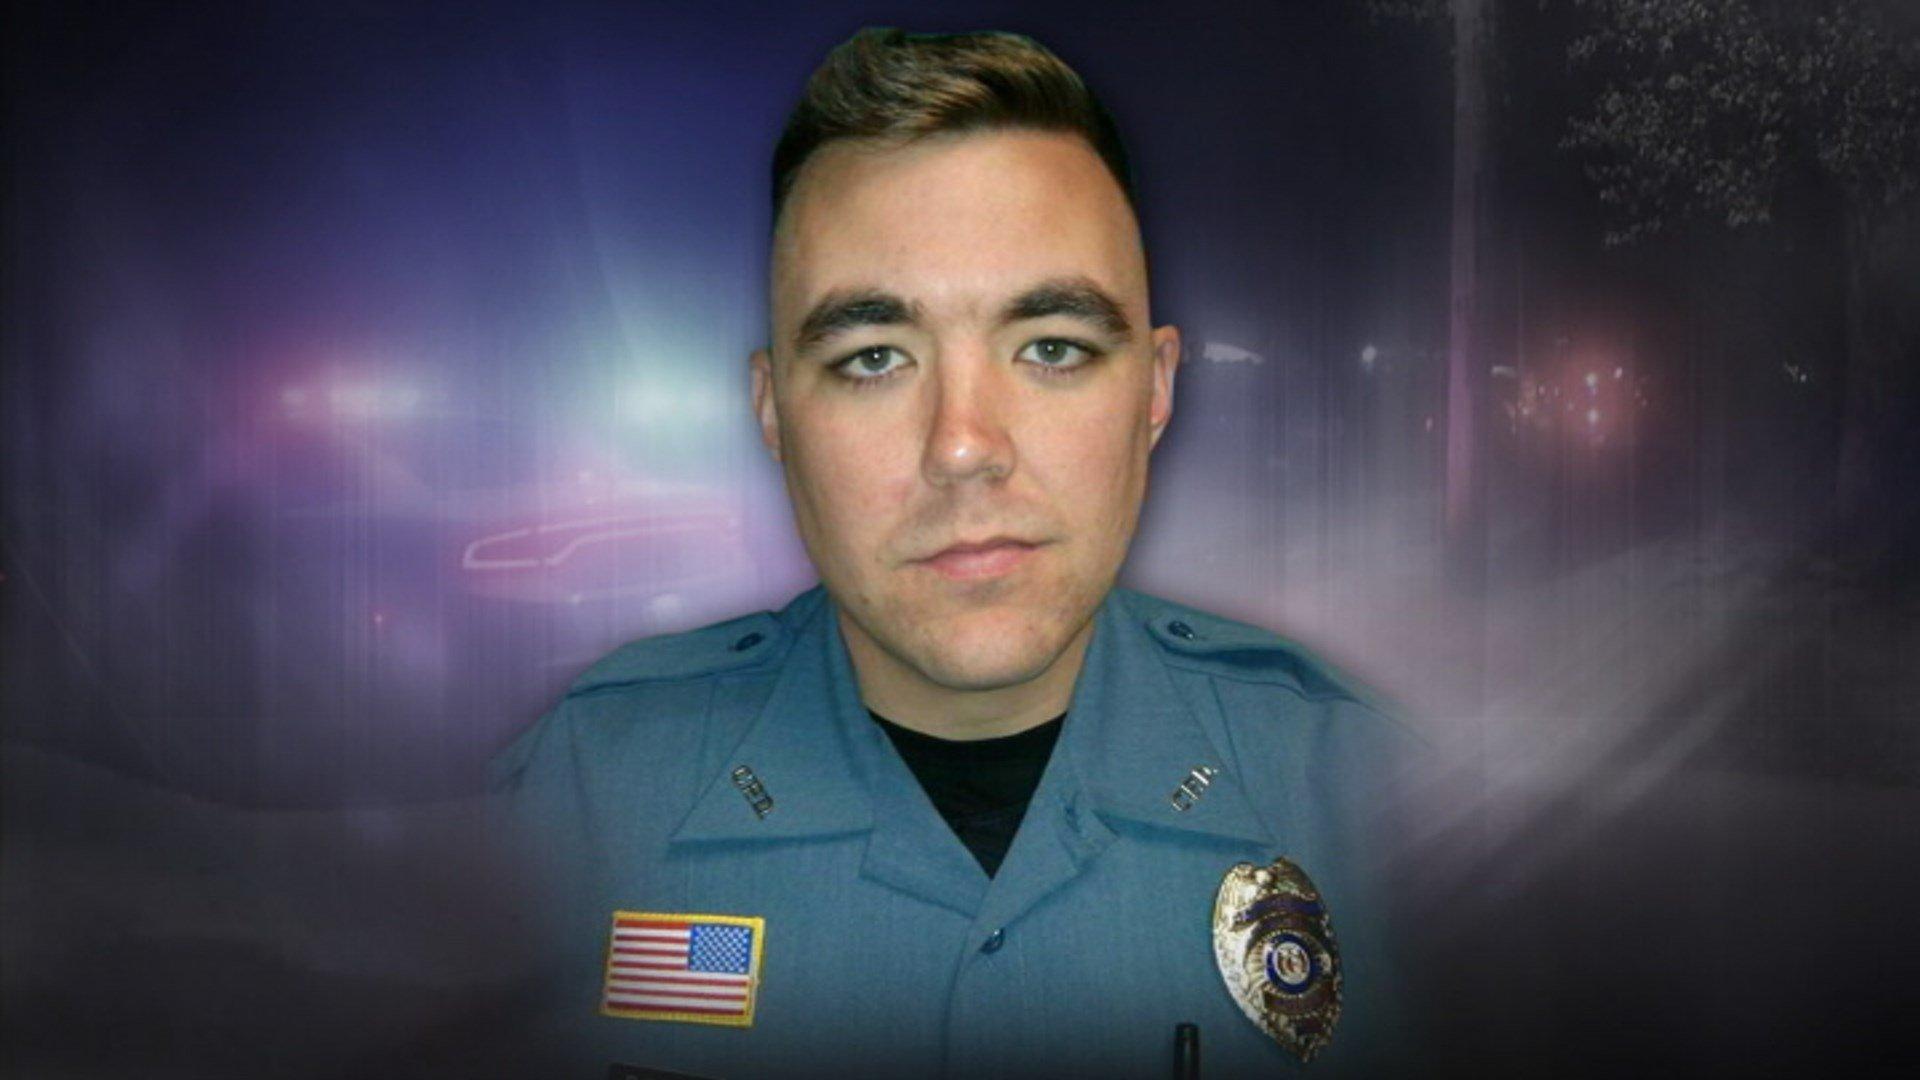 1 cop killed, 2 others shot in Missouri; suspect dead